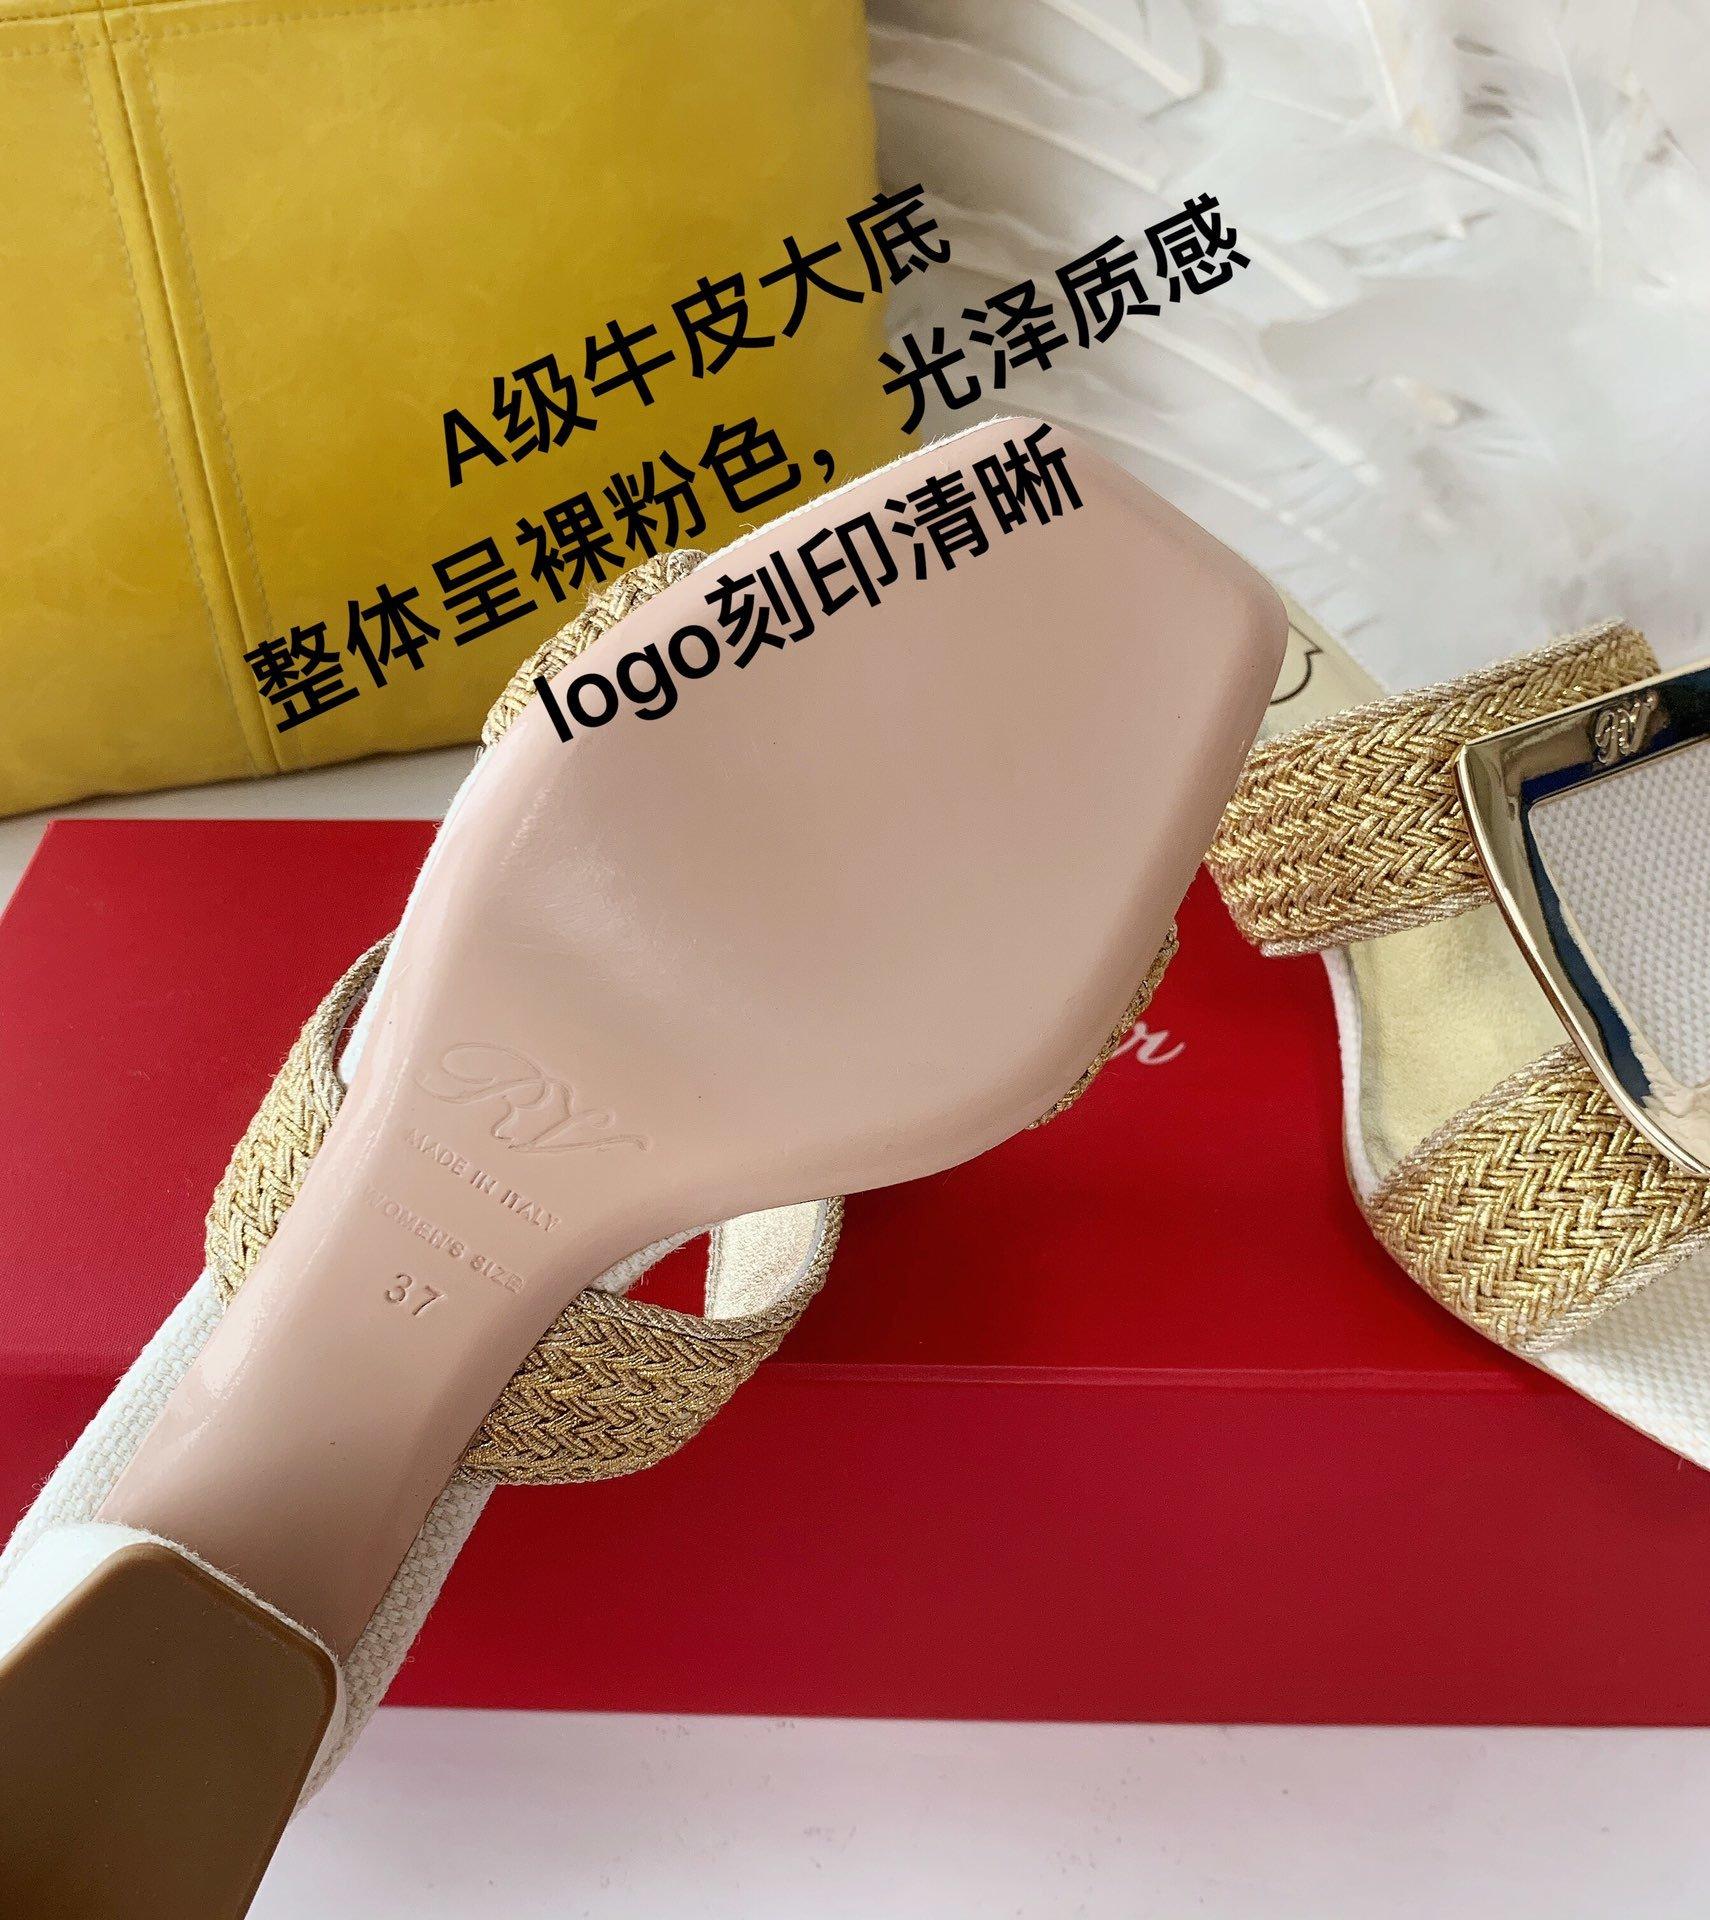 Roger Vivier编织穆勒鞋金属扣粗喇叭跟亚麻编织(图6)